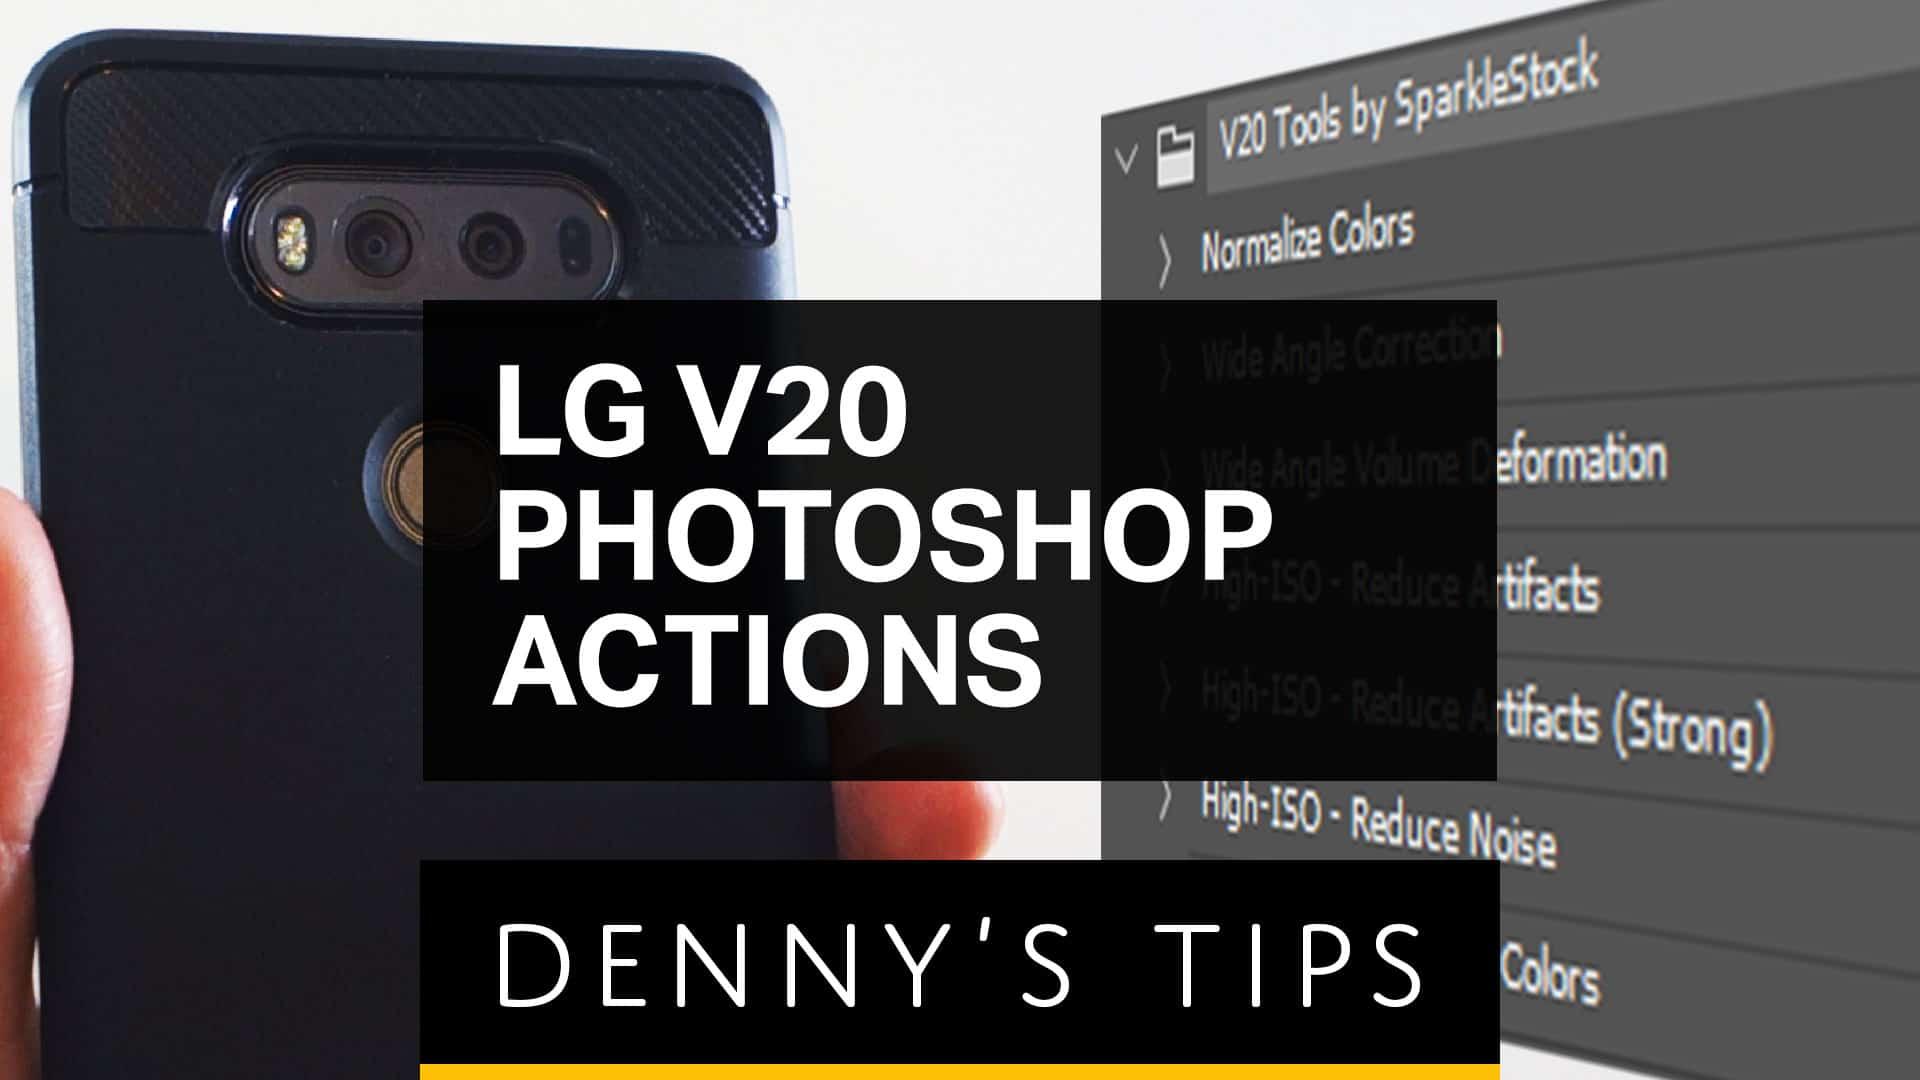 LG V20 Photoshop Actions